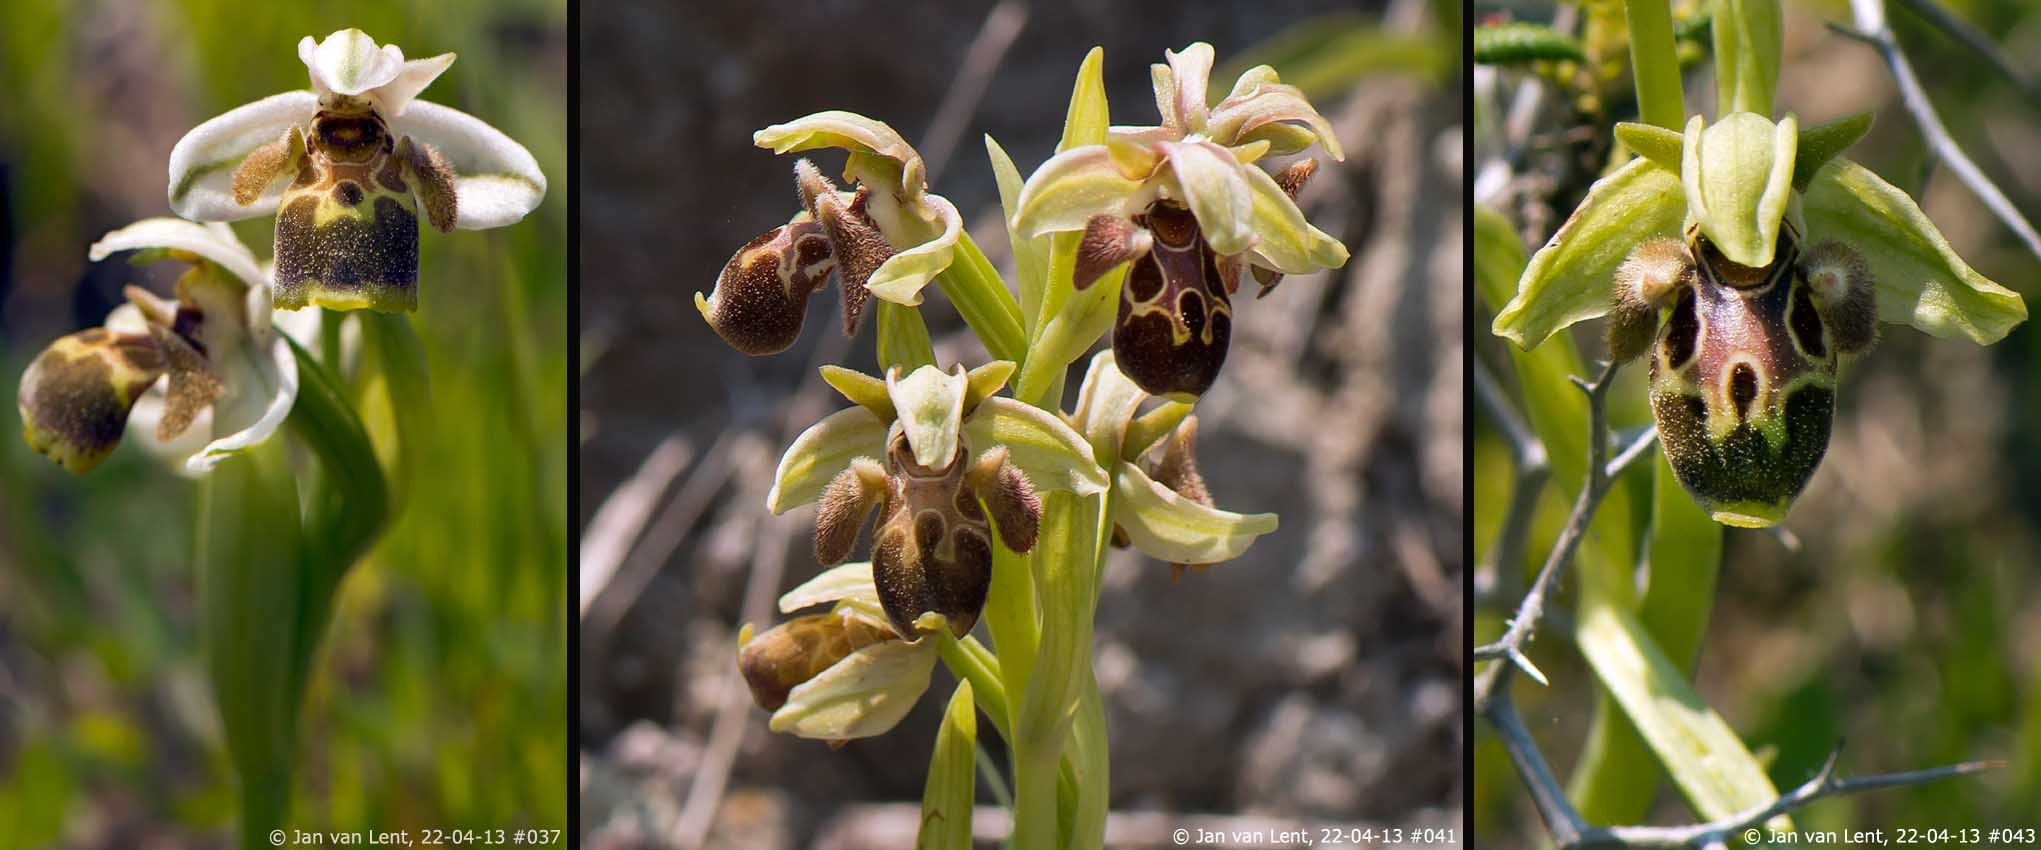 Ophrys bucephala, Andissa © Jan van Lent 22-04-2013 #037, #041, #043